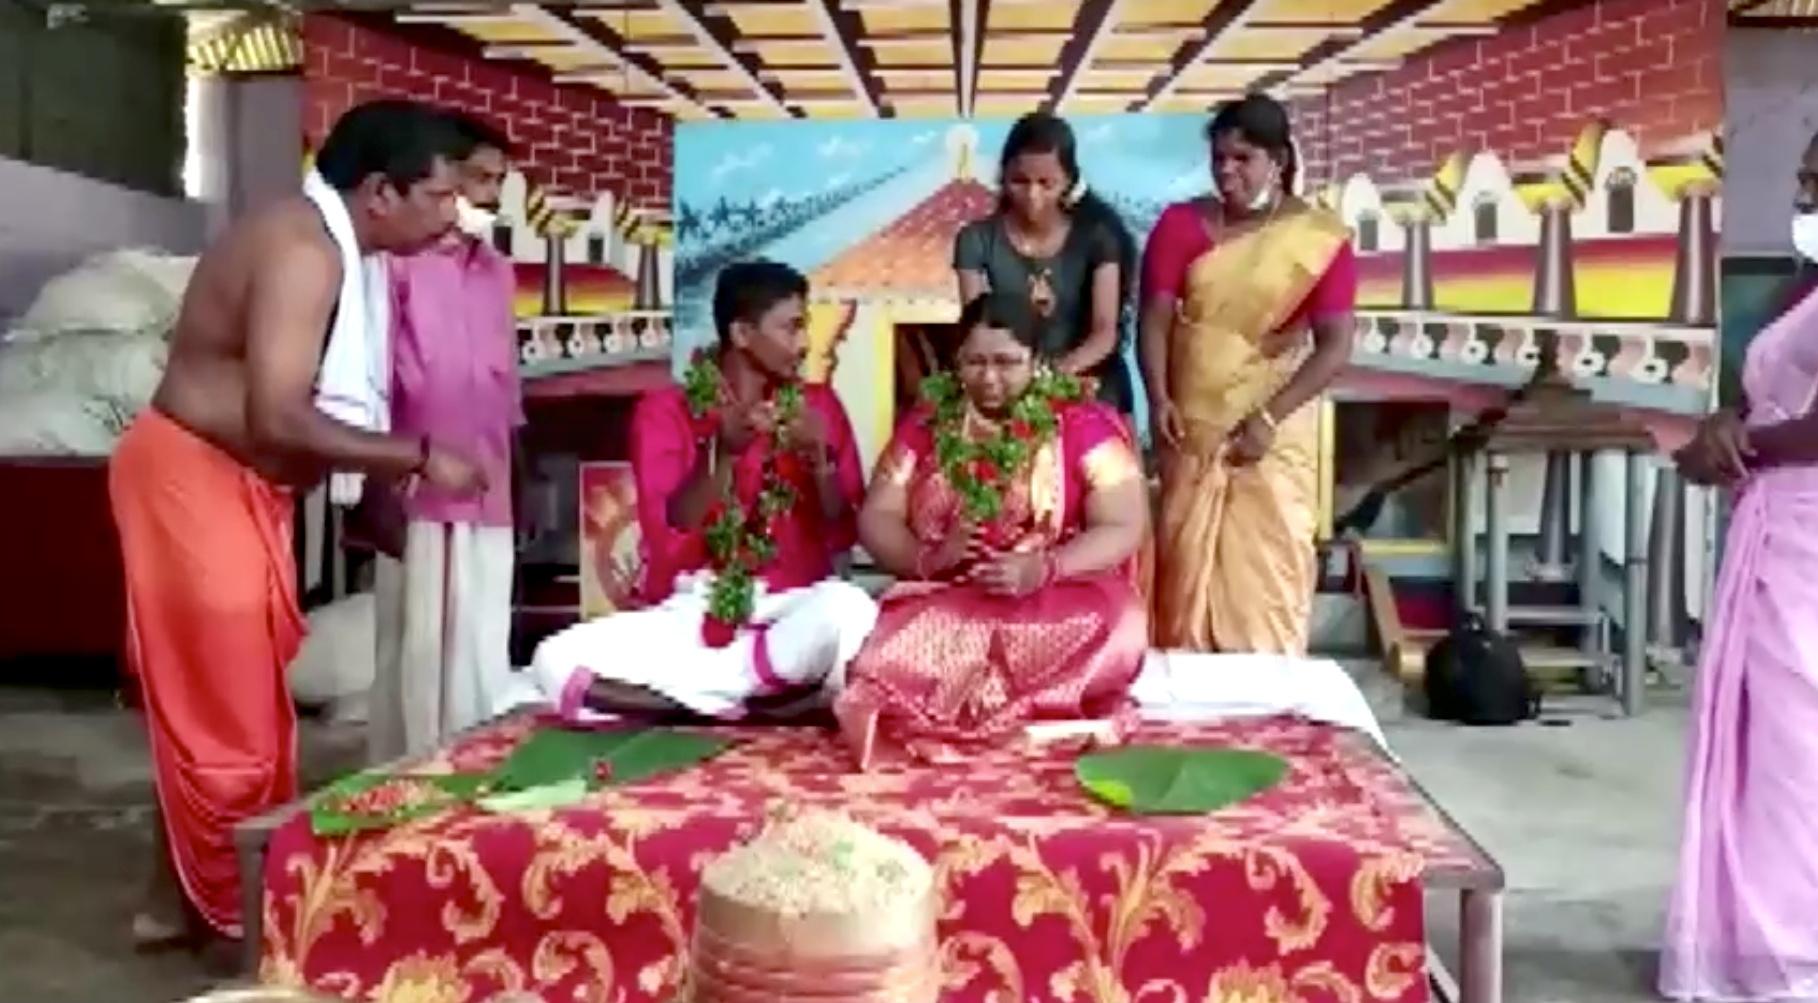 بالفيديو..عريسان هنديان يتوجهان لزفافهم بـ